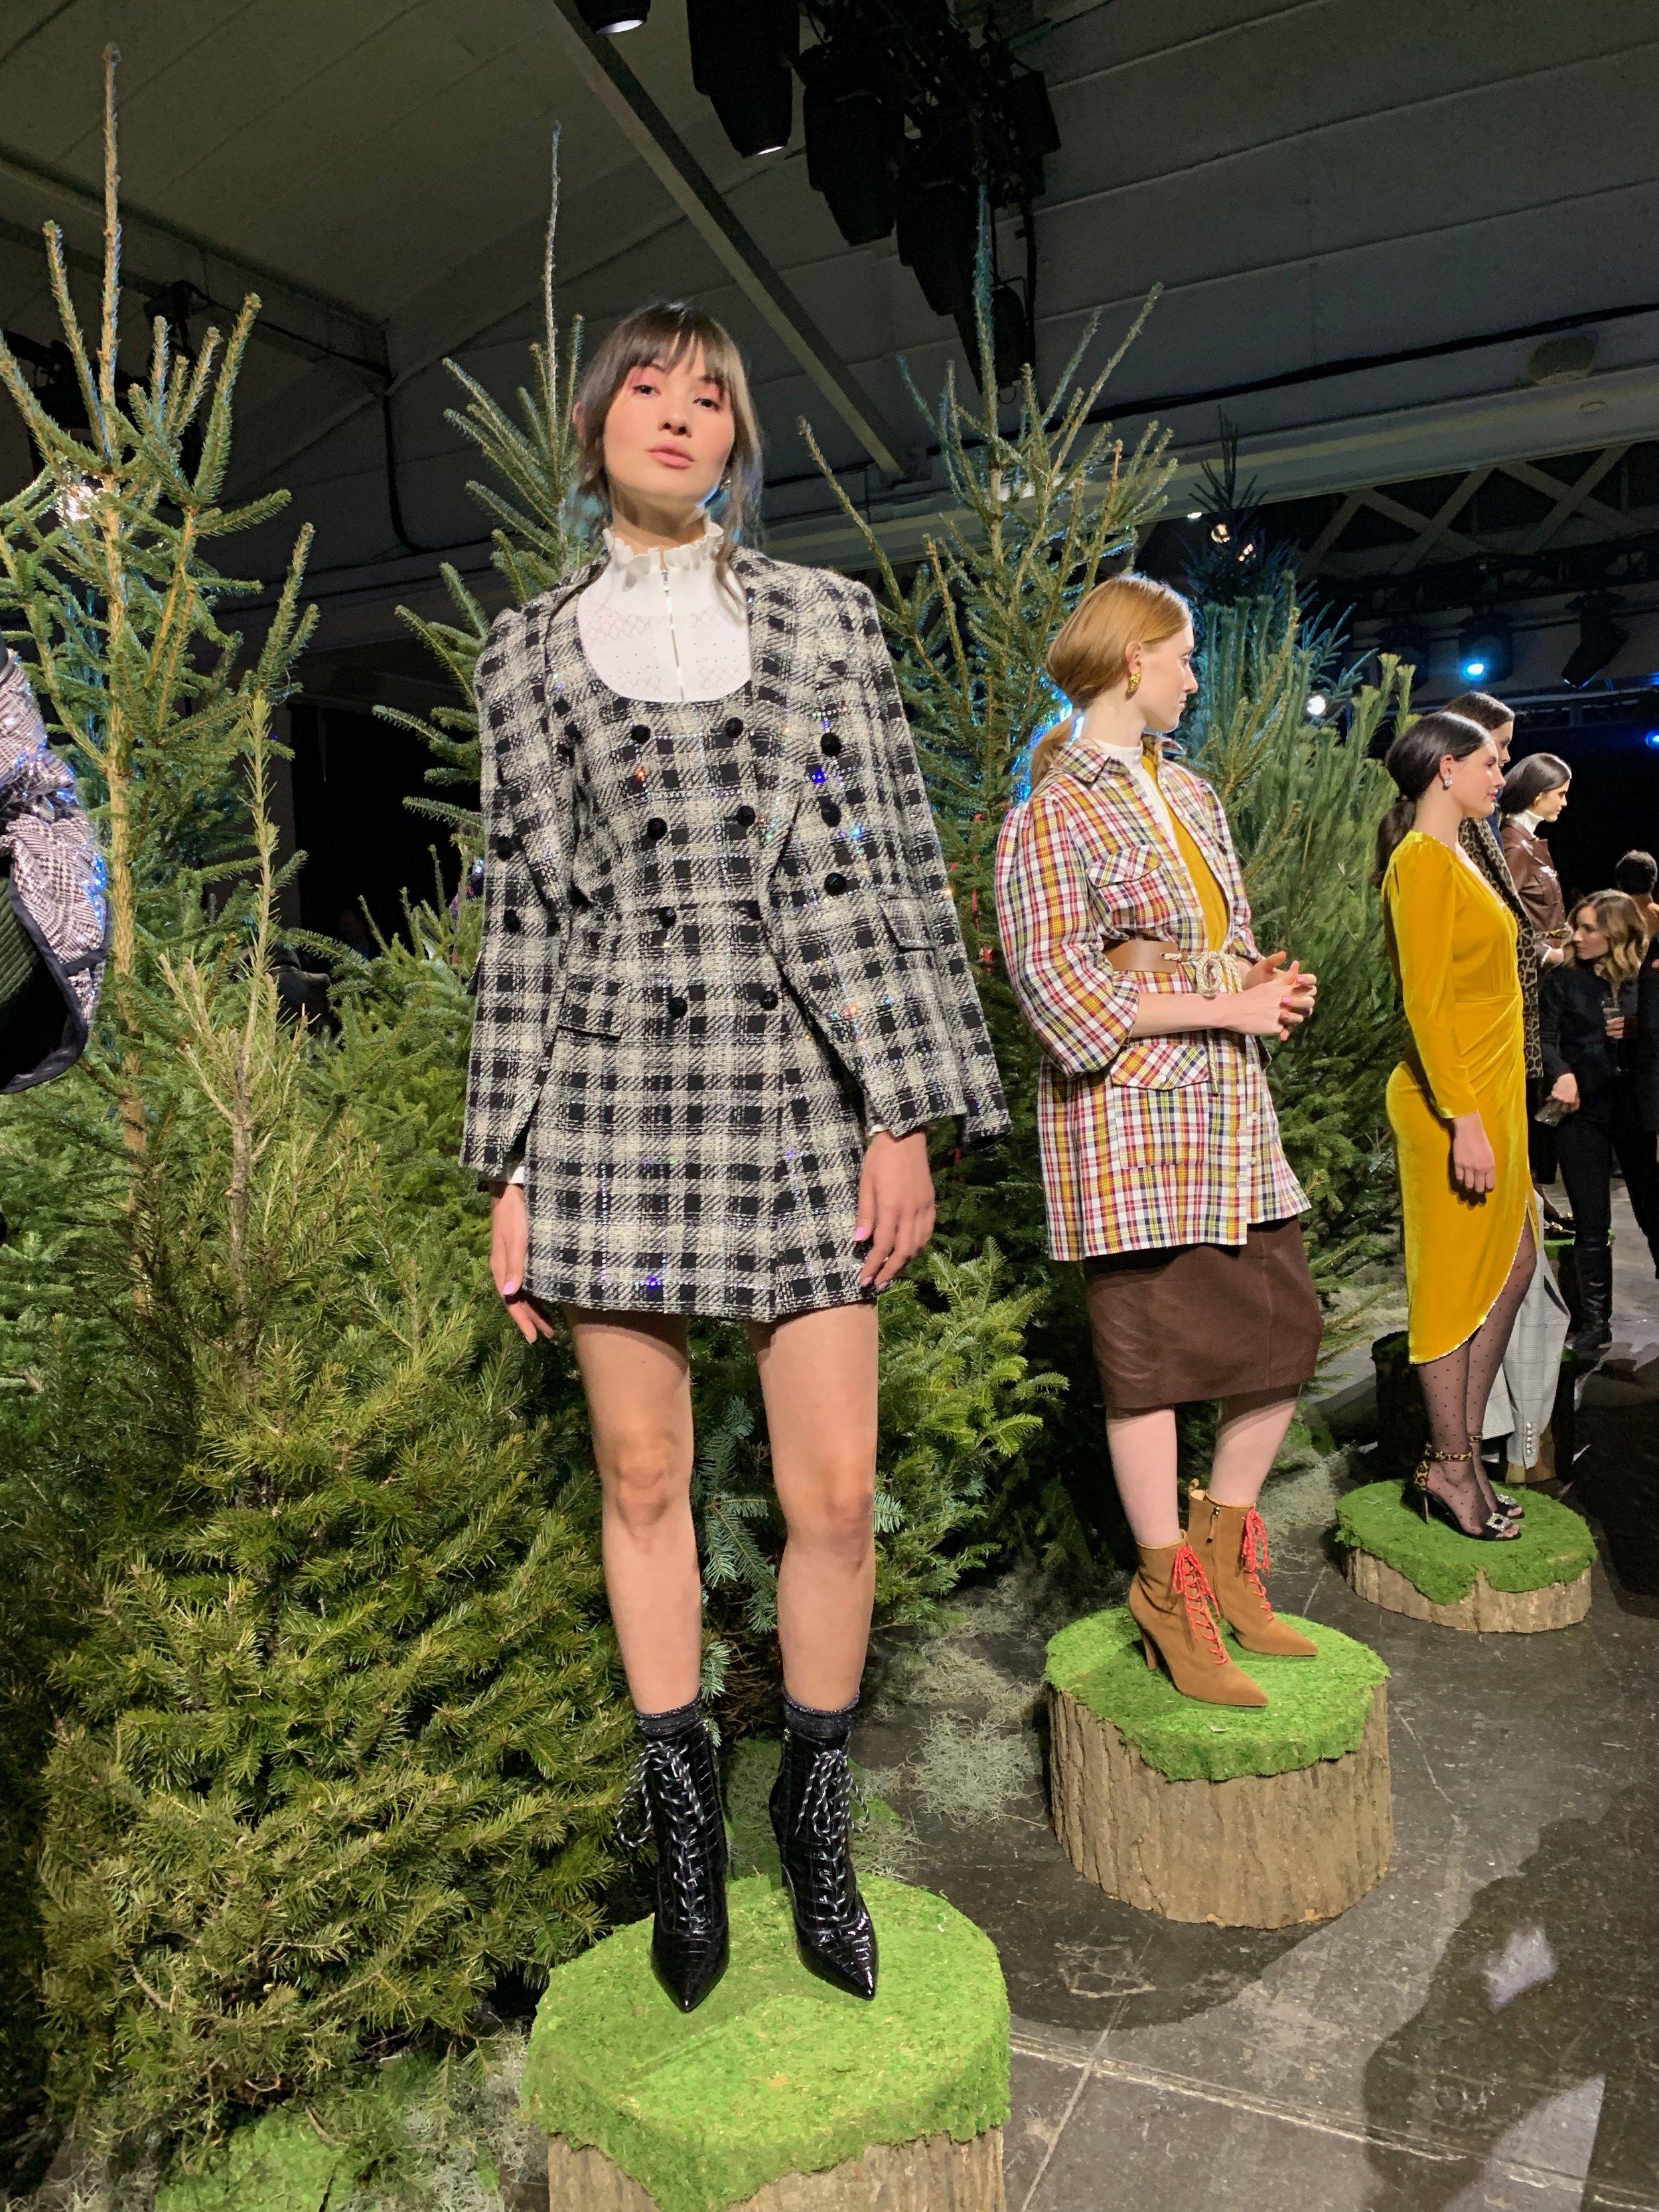 Model is wearing: Ivory SILVI Sweater, Rhinestone Plaid SONDRA Dress, Rhinestone Plaid MILLER Dickey Jacket, Black Paula Boots